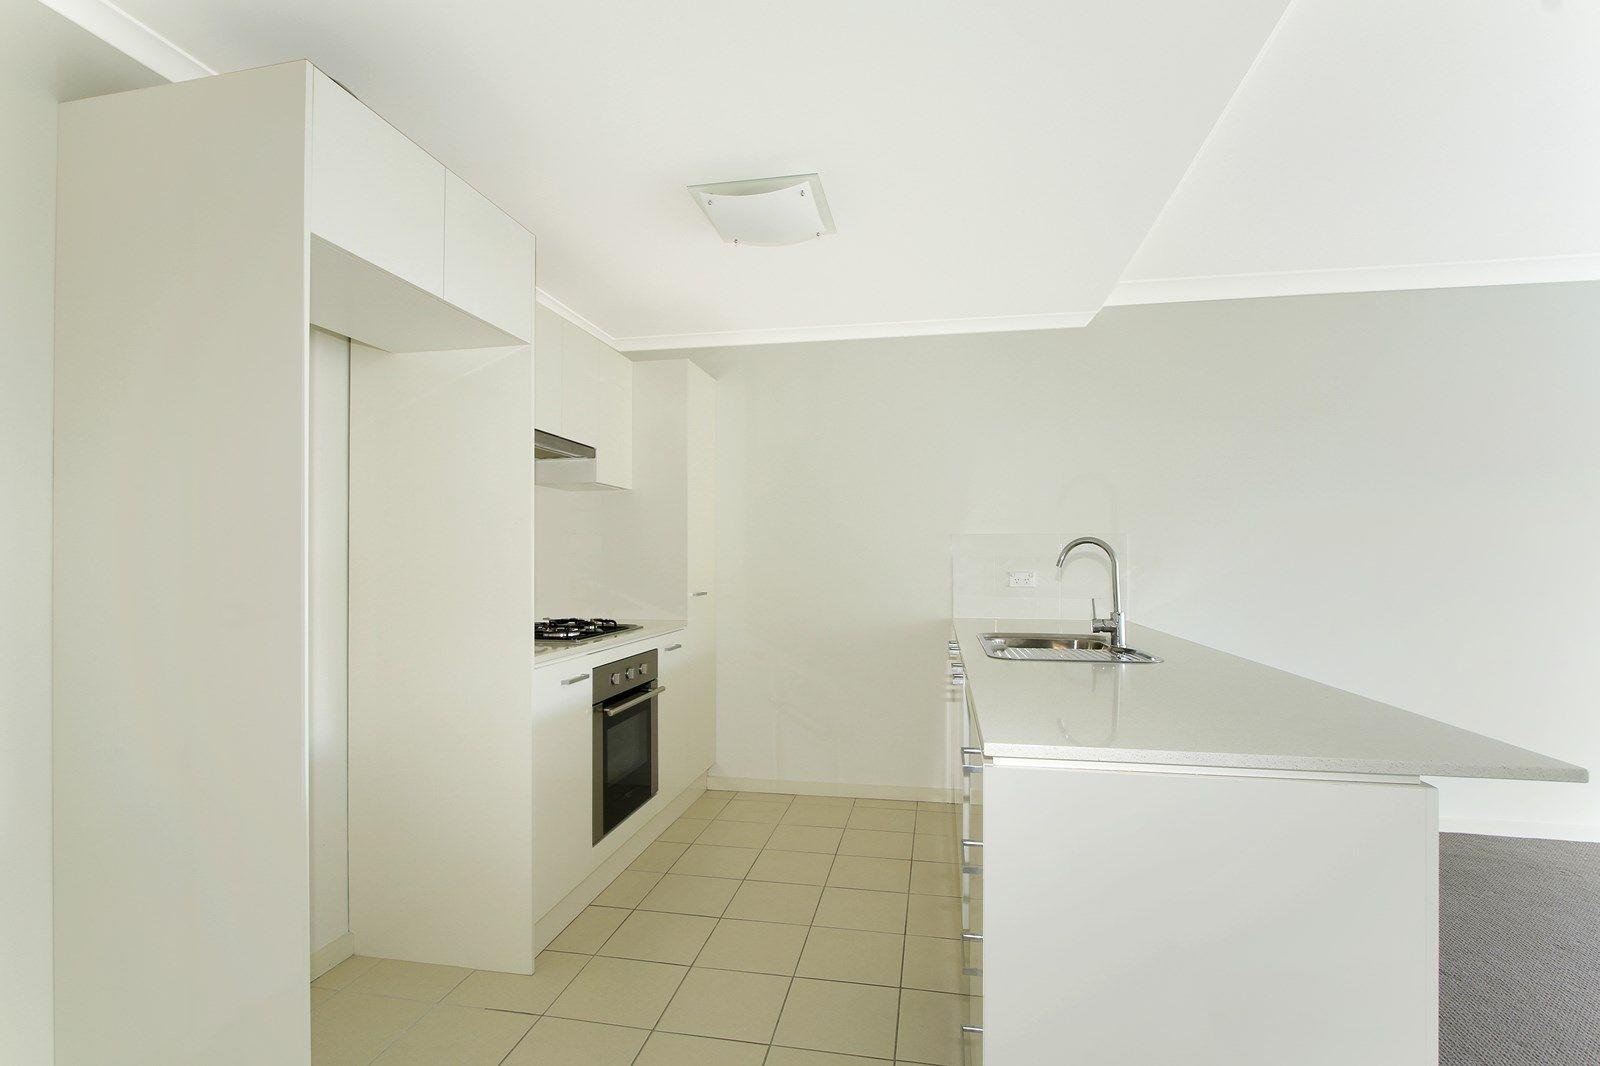 22/2-6 Noel Street, North Wollongong NSW 2500, Image 1